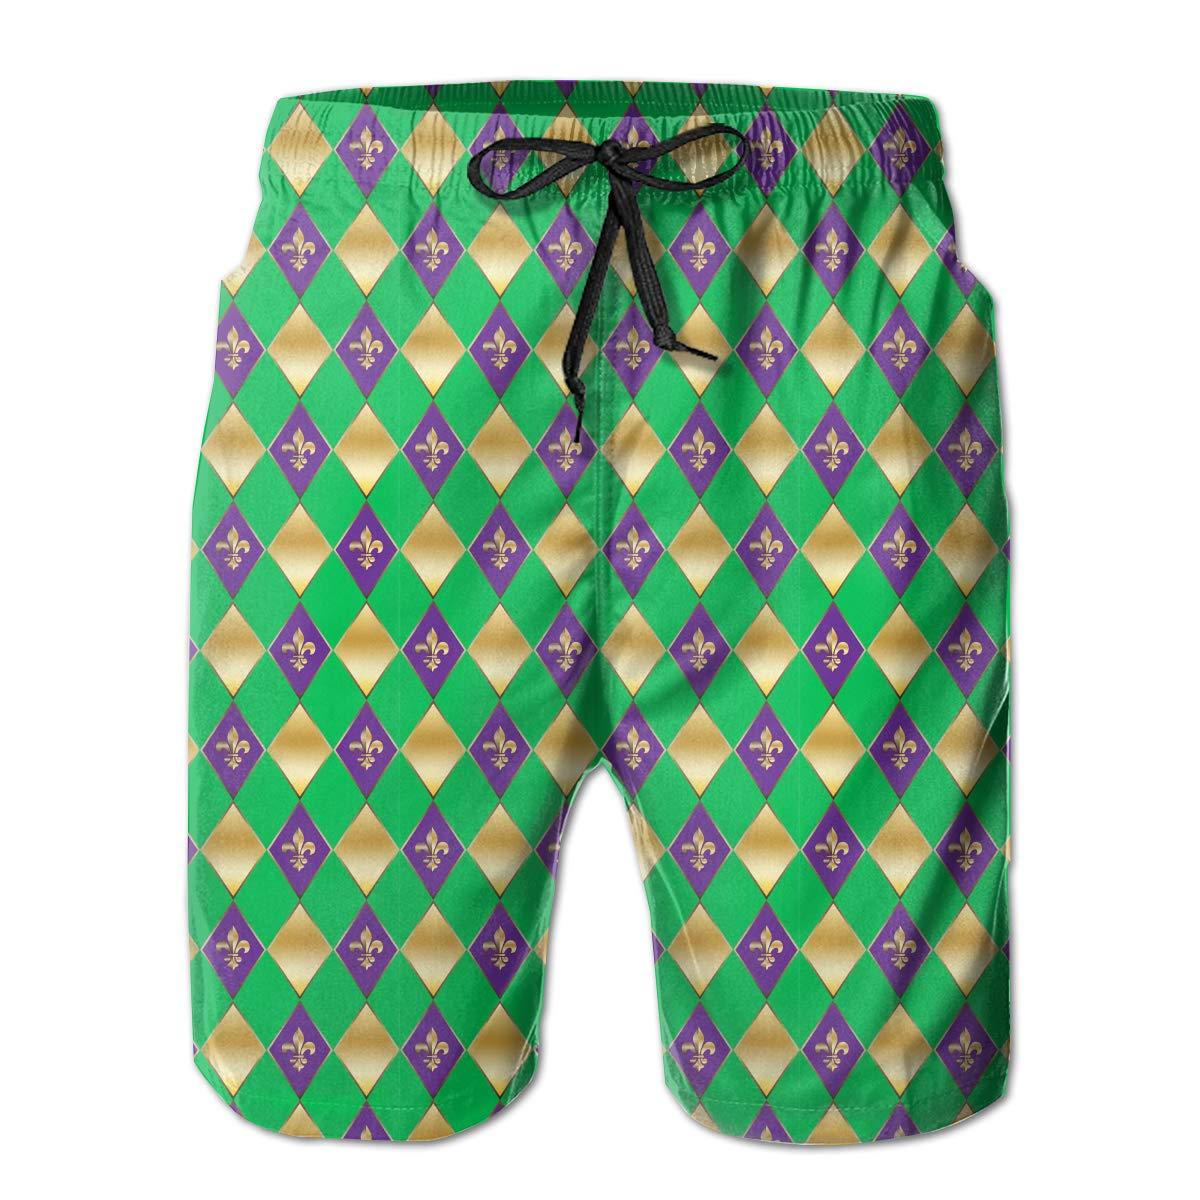 Carnival Festival Masquerade Mardi Gras Checkered Geometric Mens Swim Trunks Board Beachwear Casual Beach Shorts for Men